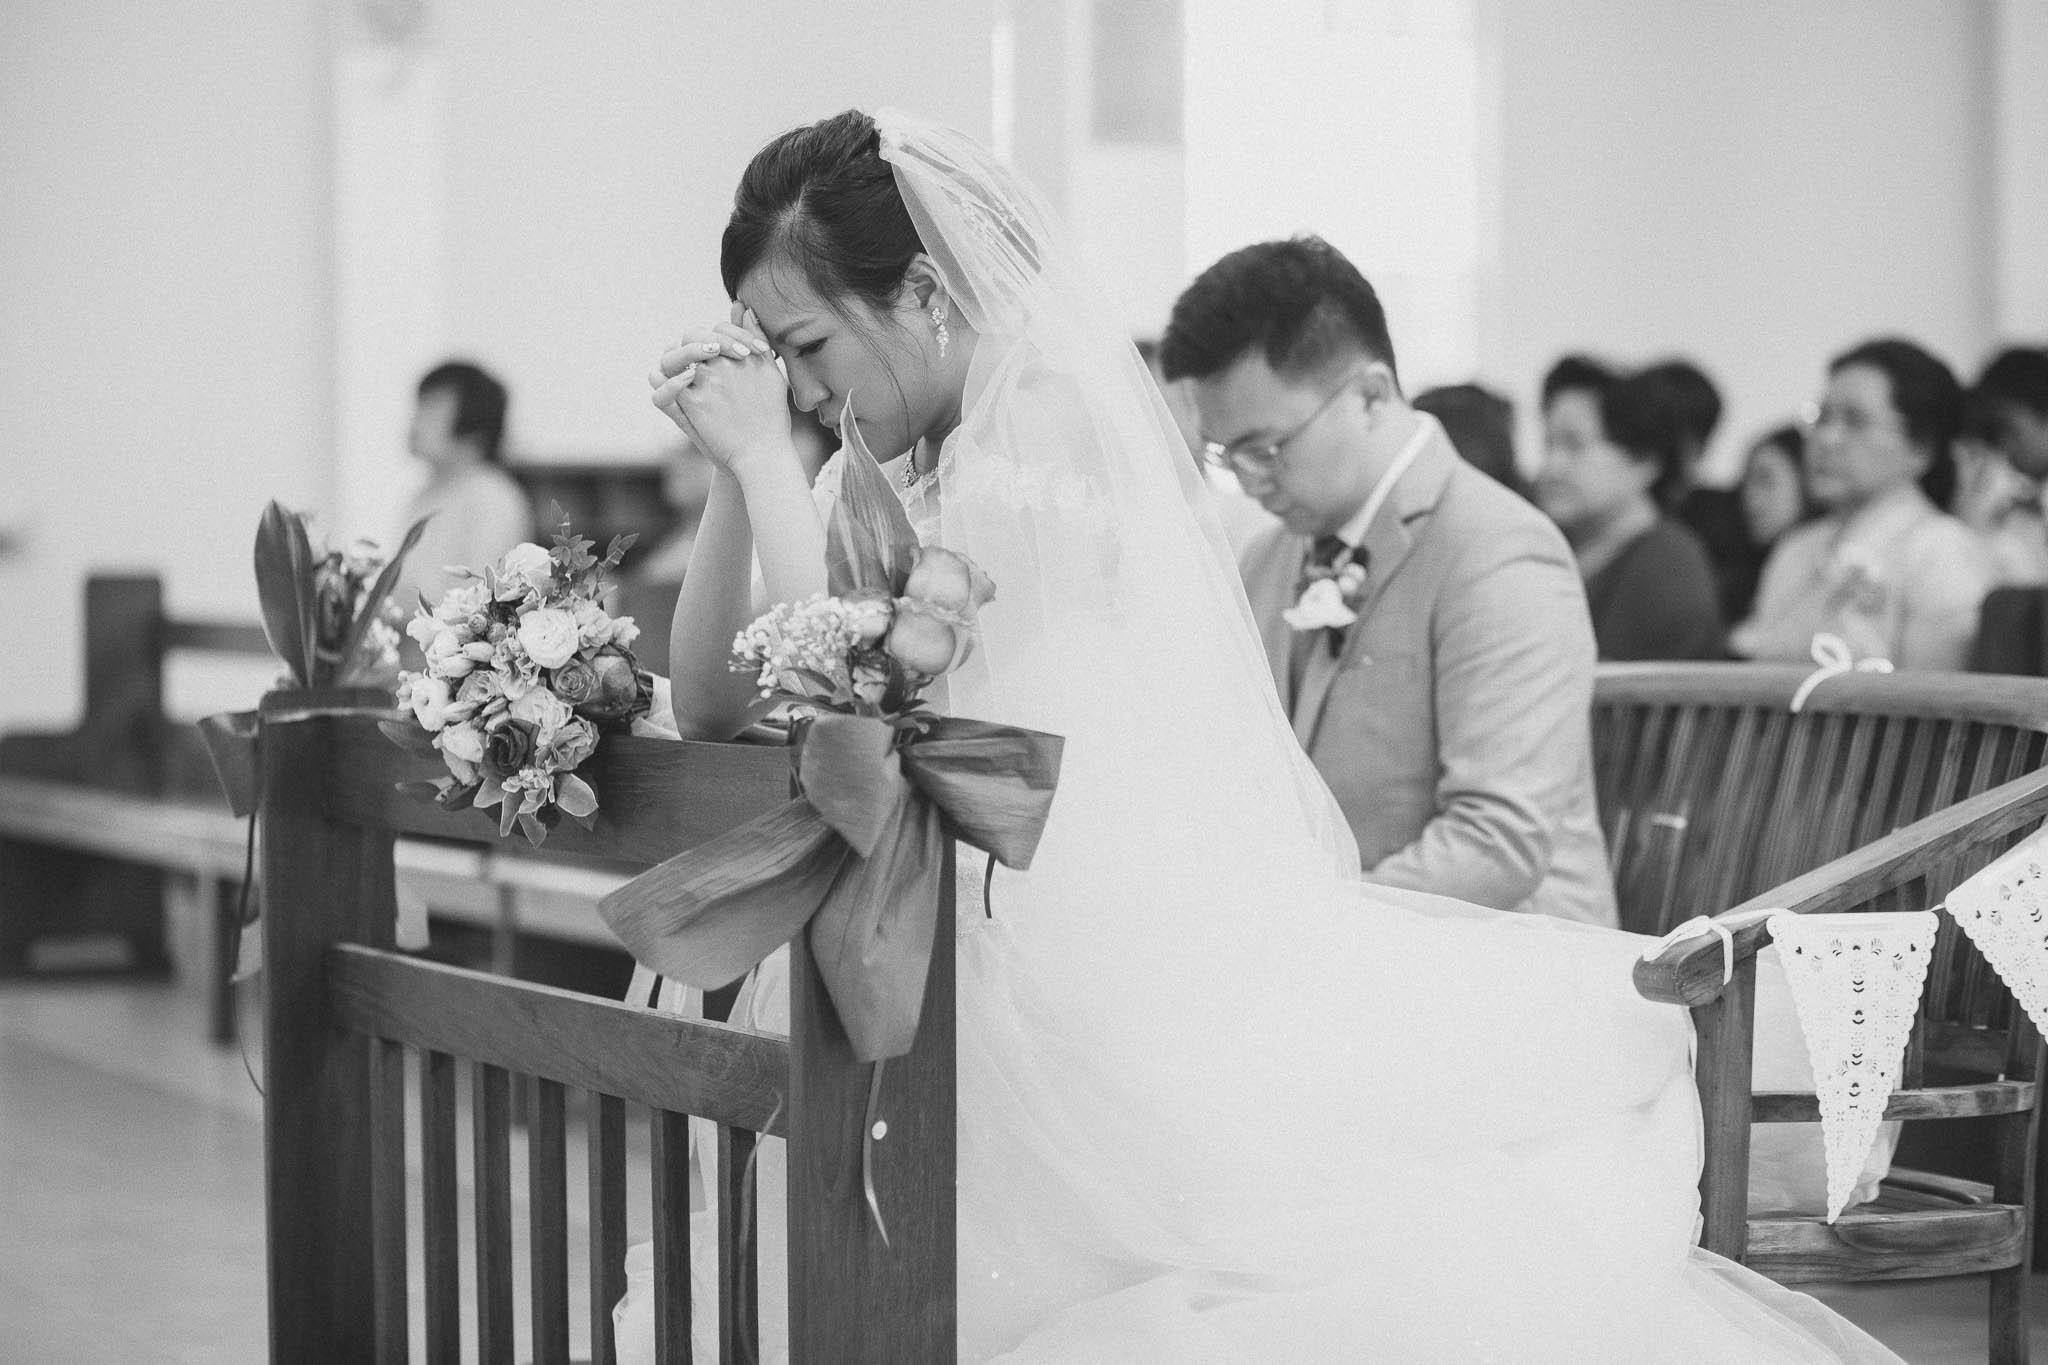 singapore-wedding-photographer-malay-indian-pre-wedding-travel-wmt-2015-65.jpg